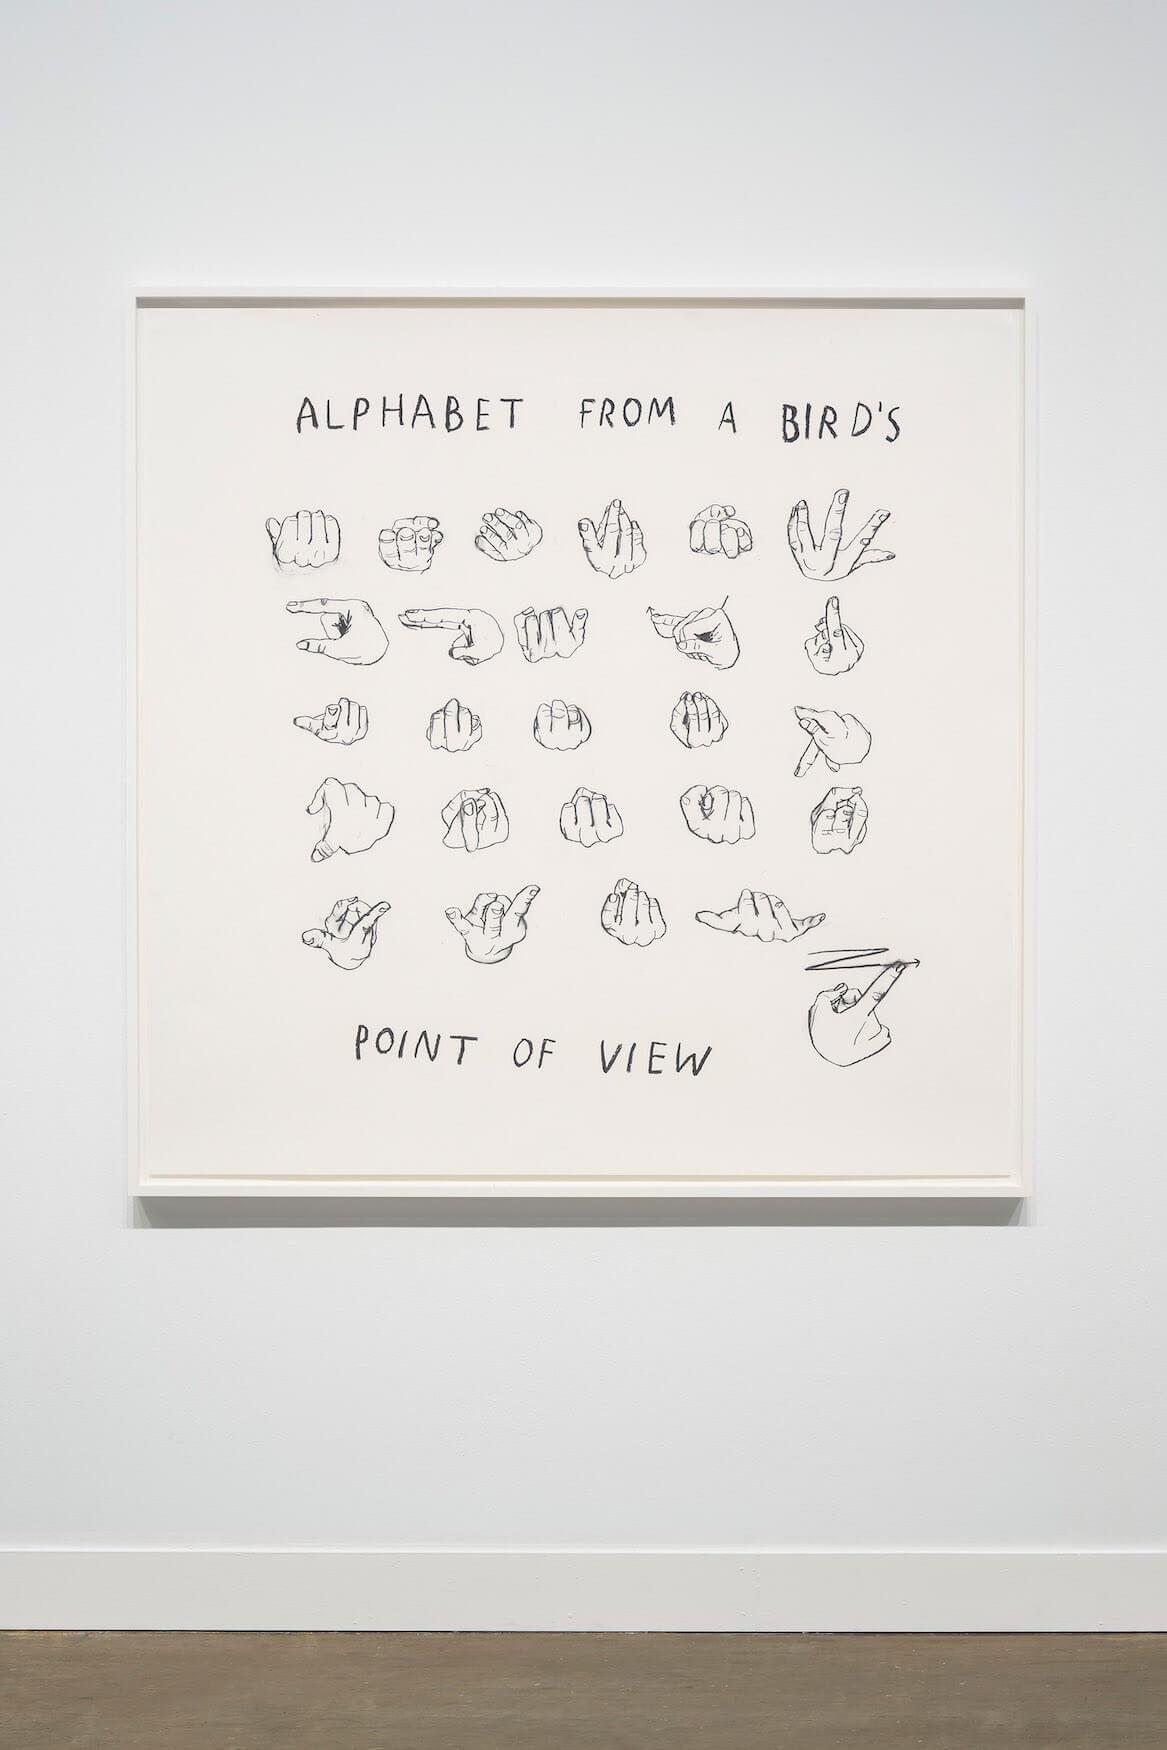 Kim, Alphabet From a Bird's Point of View, 2019 (CSK 19.019) B